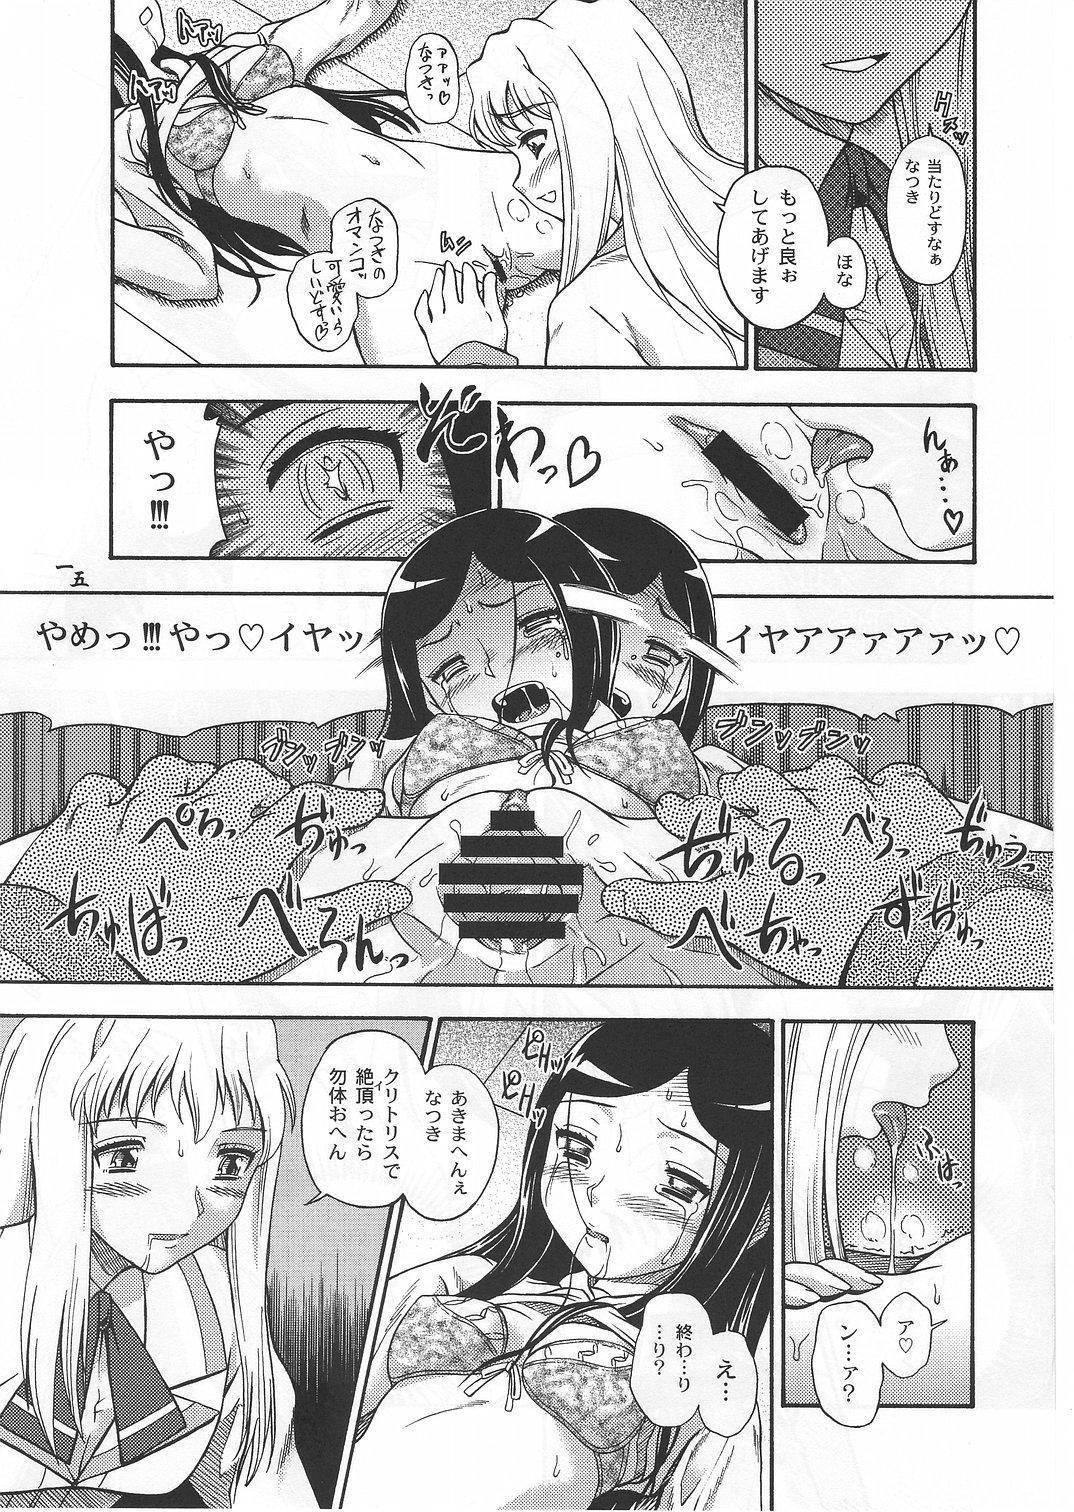 Amai Himegoto Nikaime 13